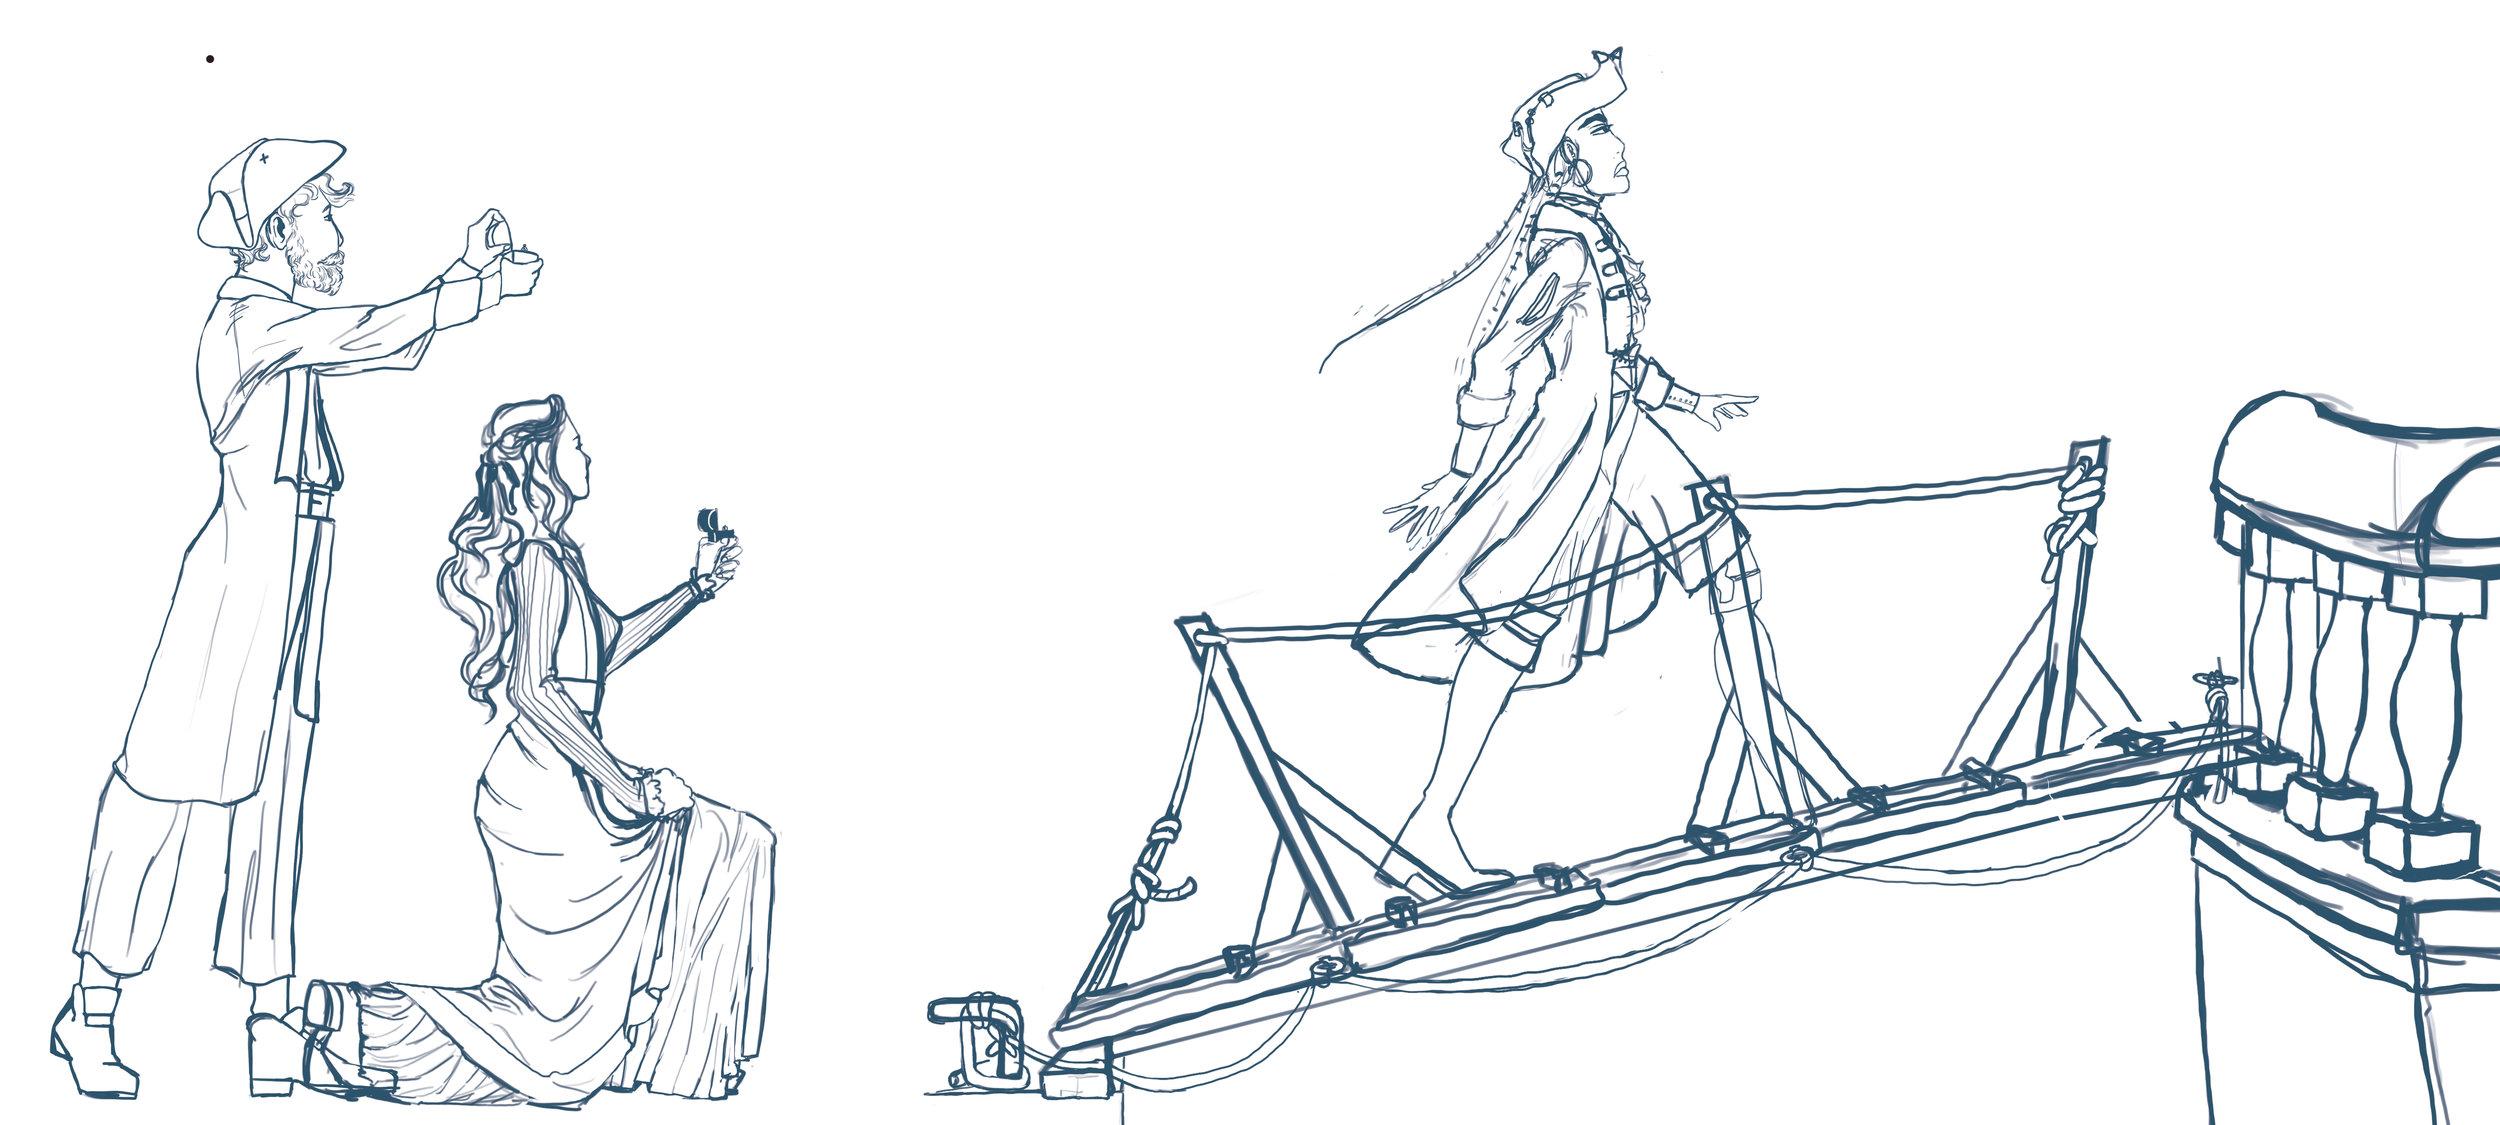 5 6_Sketch RBG.jpg